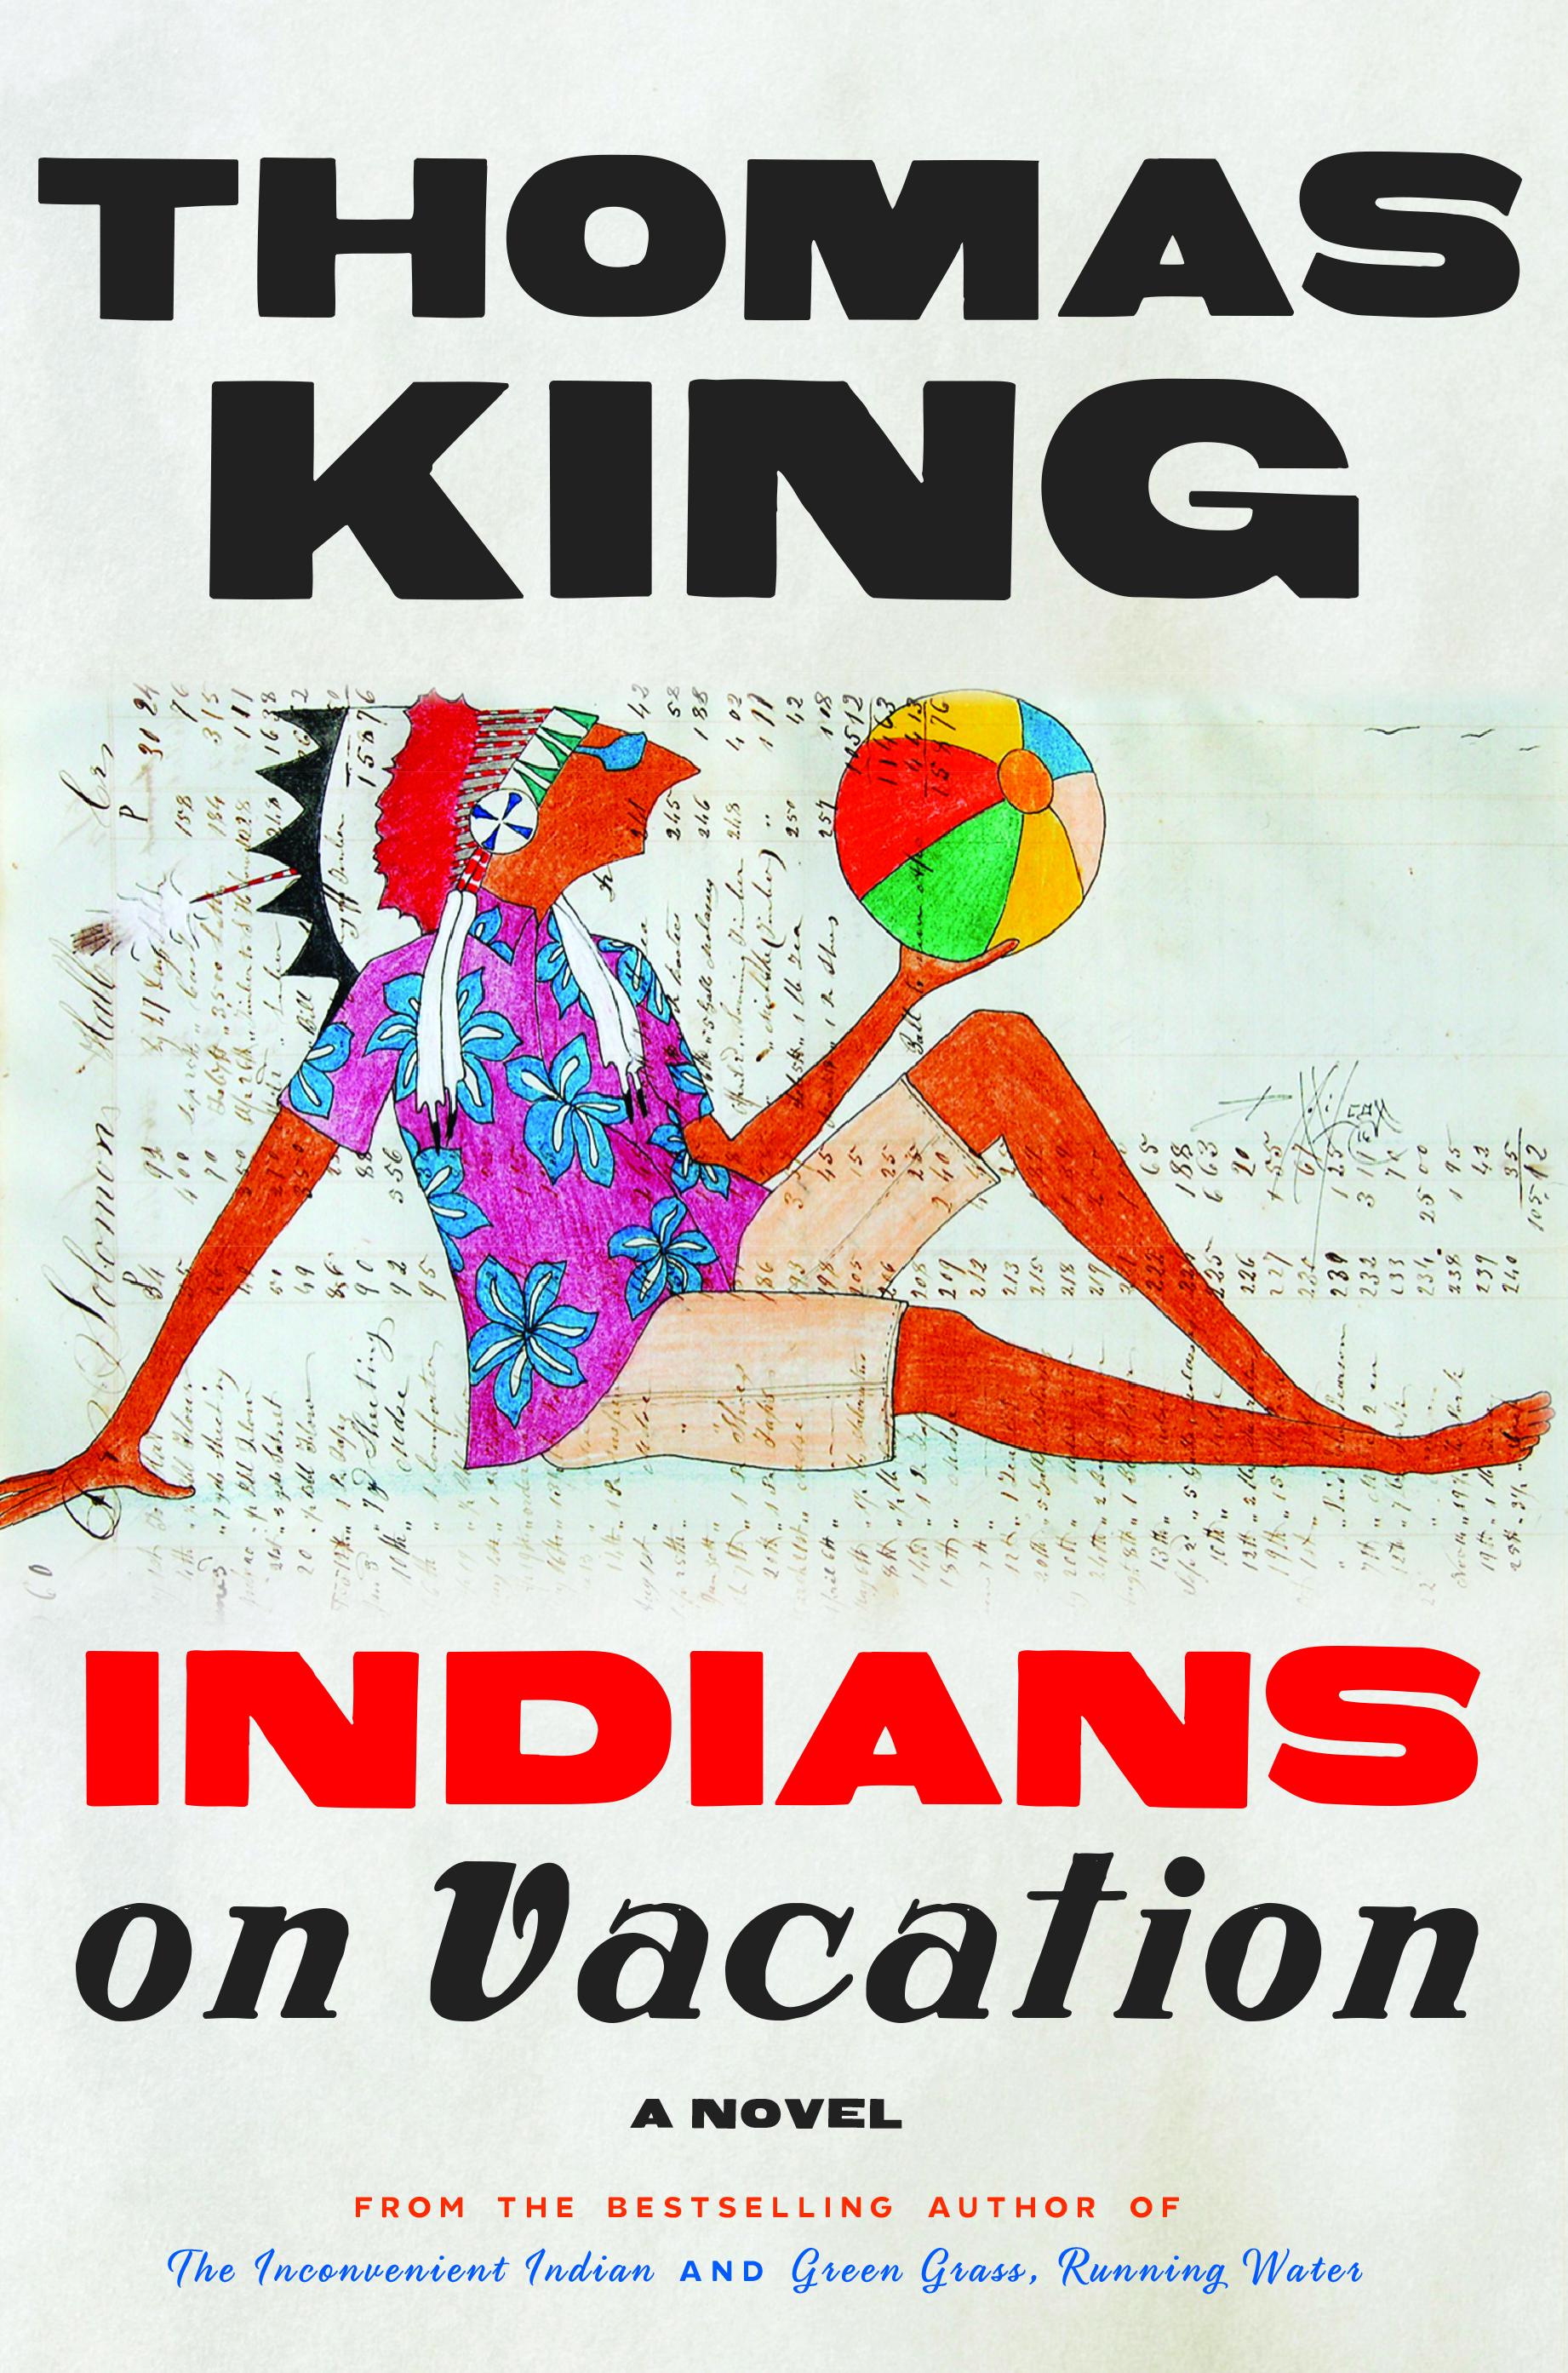 King Thomas Indians on Vacation Book Jacket